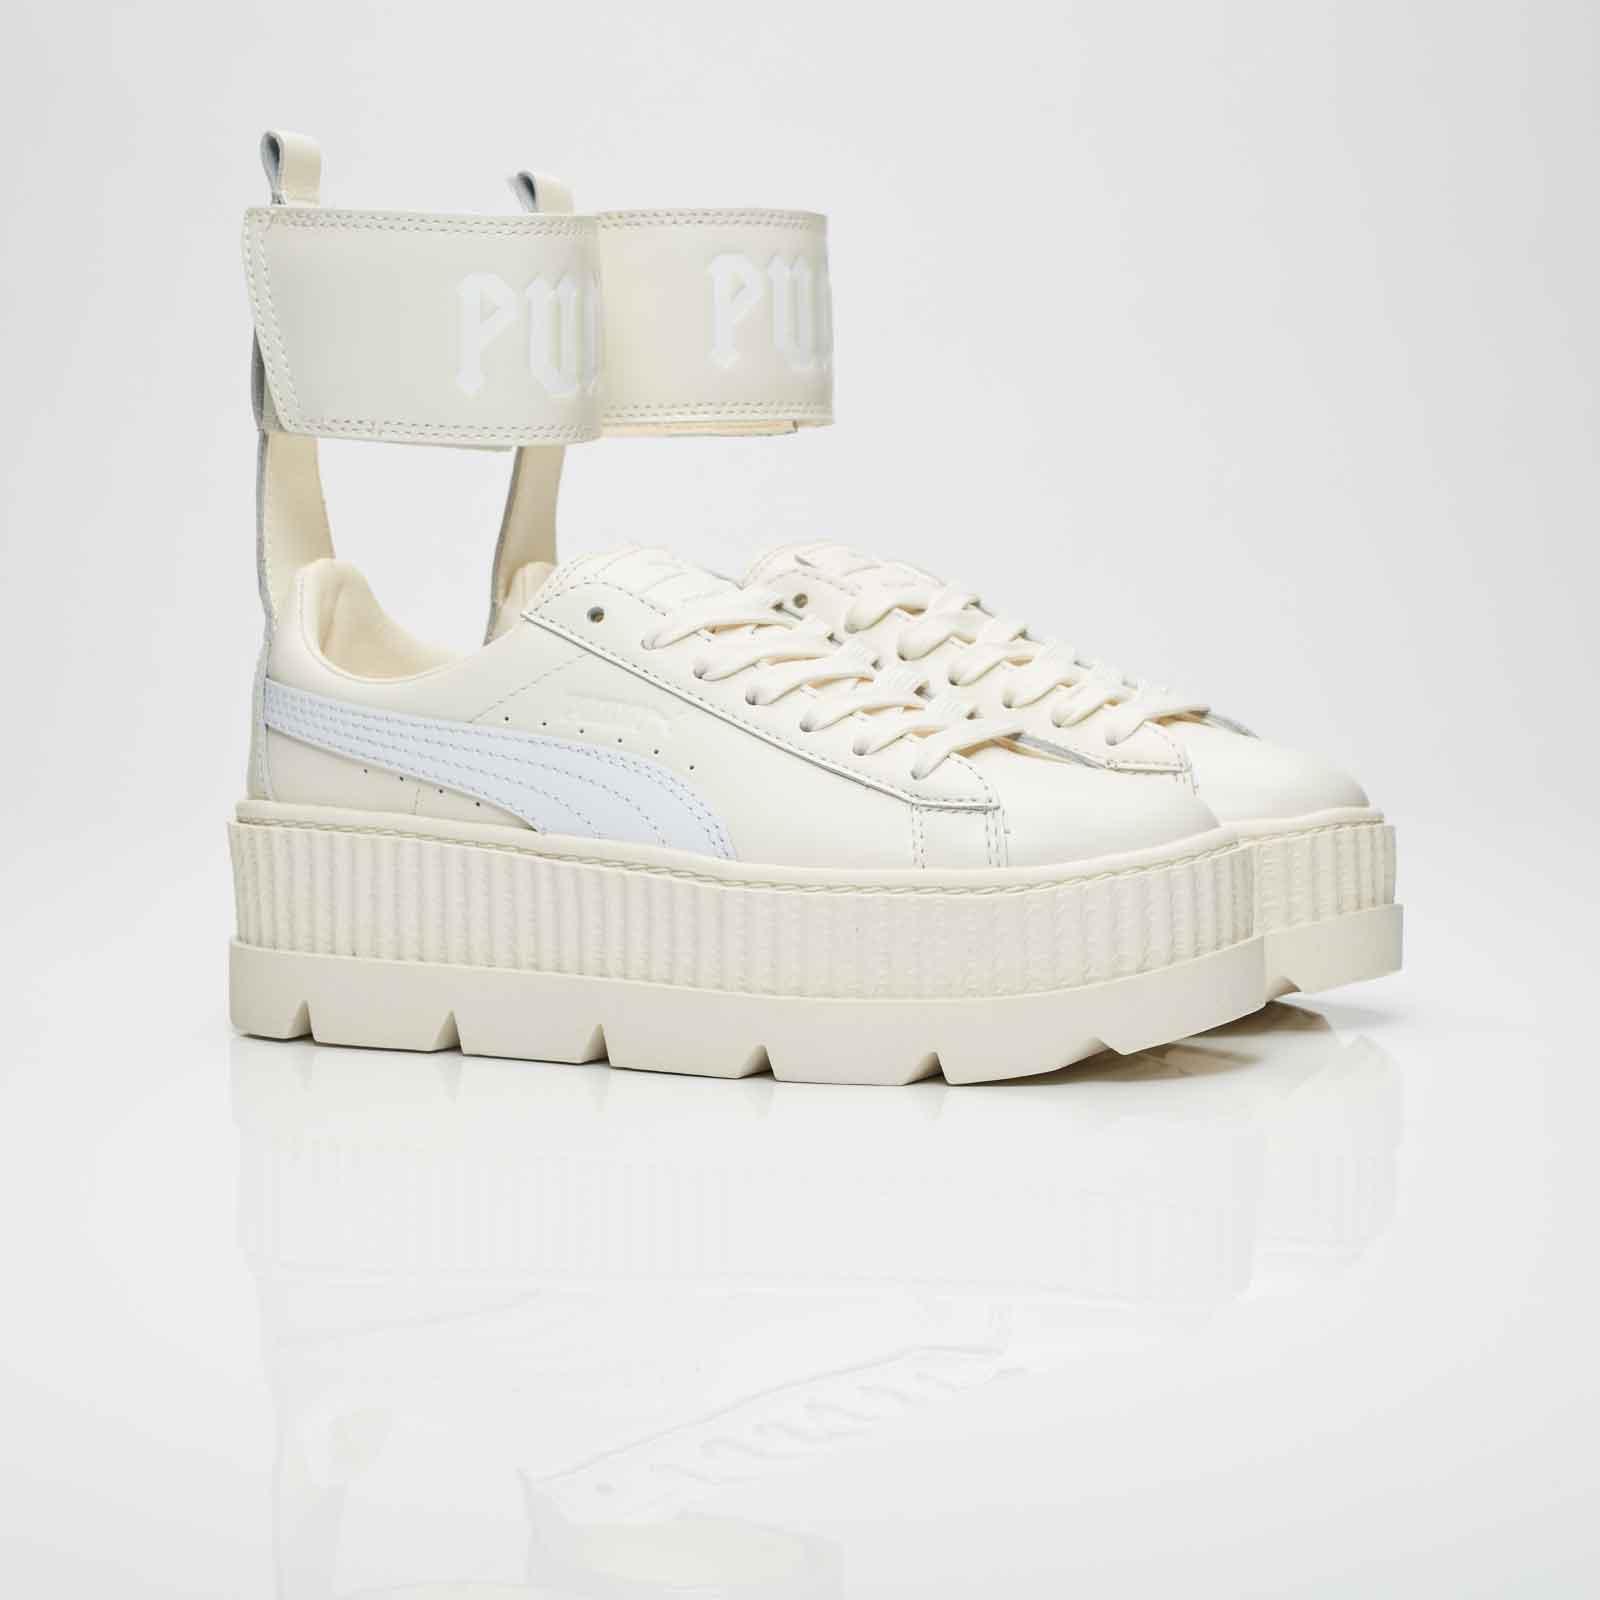 3699e31093a Puma Ankle Strap Sneaker Wns - 366264-02 - Sneakersnstuff